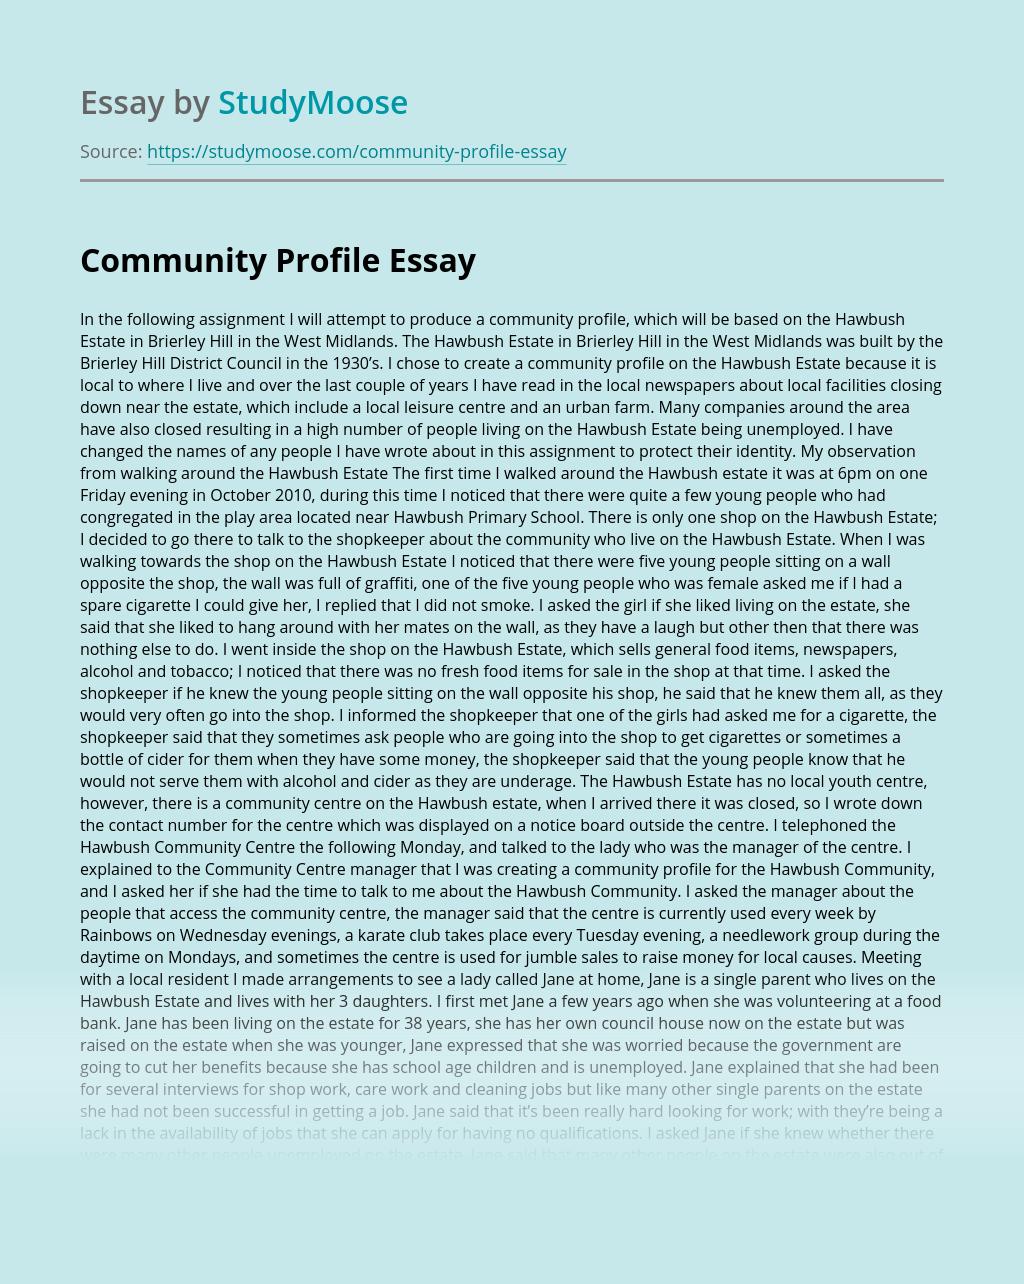 Community Profile